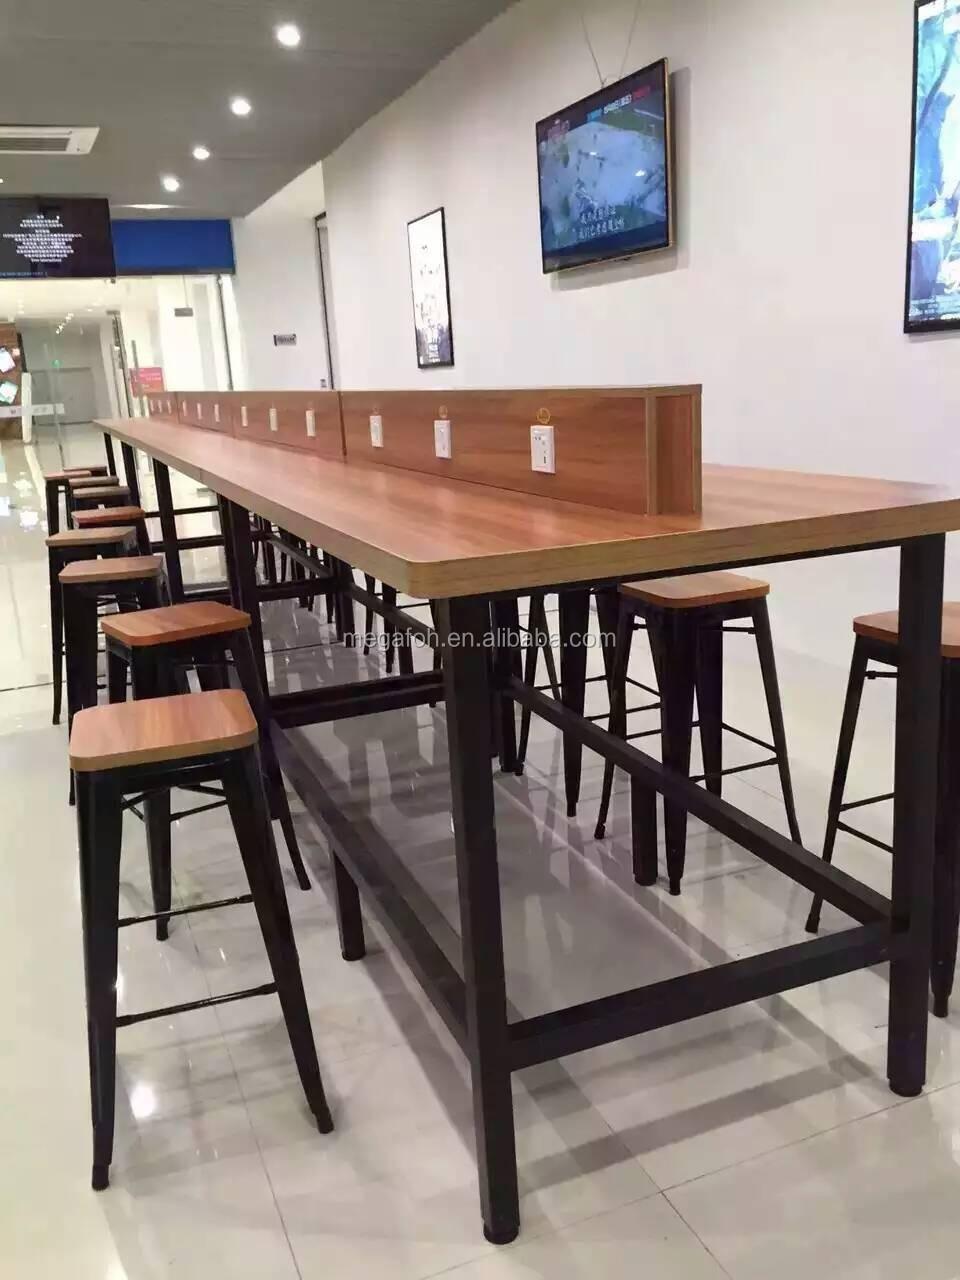 Solid Rustic Wood Long Bar Table Top Metal Base Bar Stool